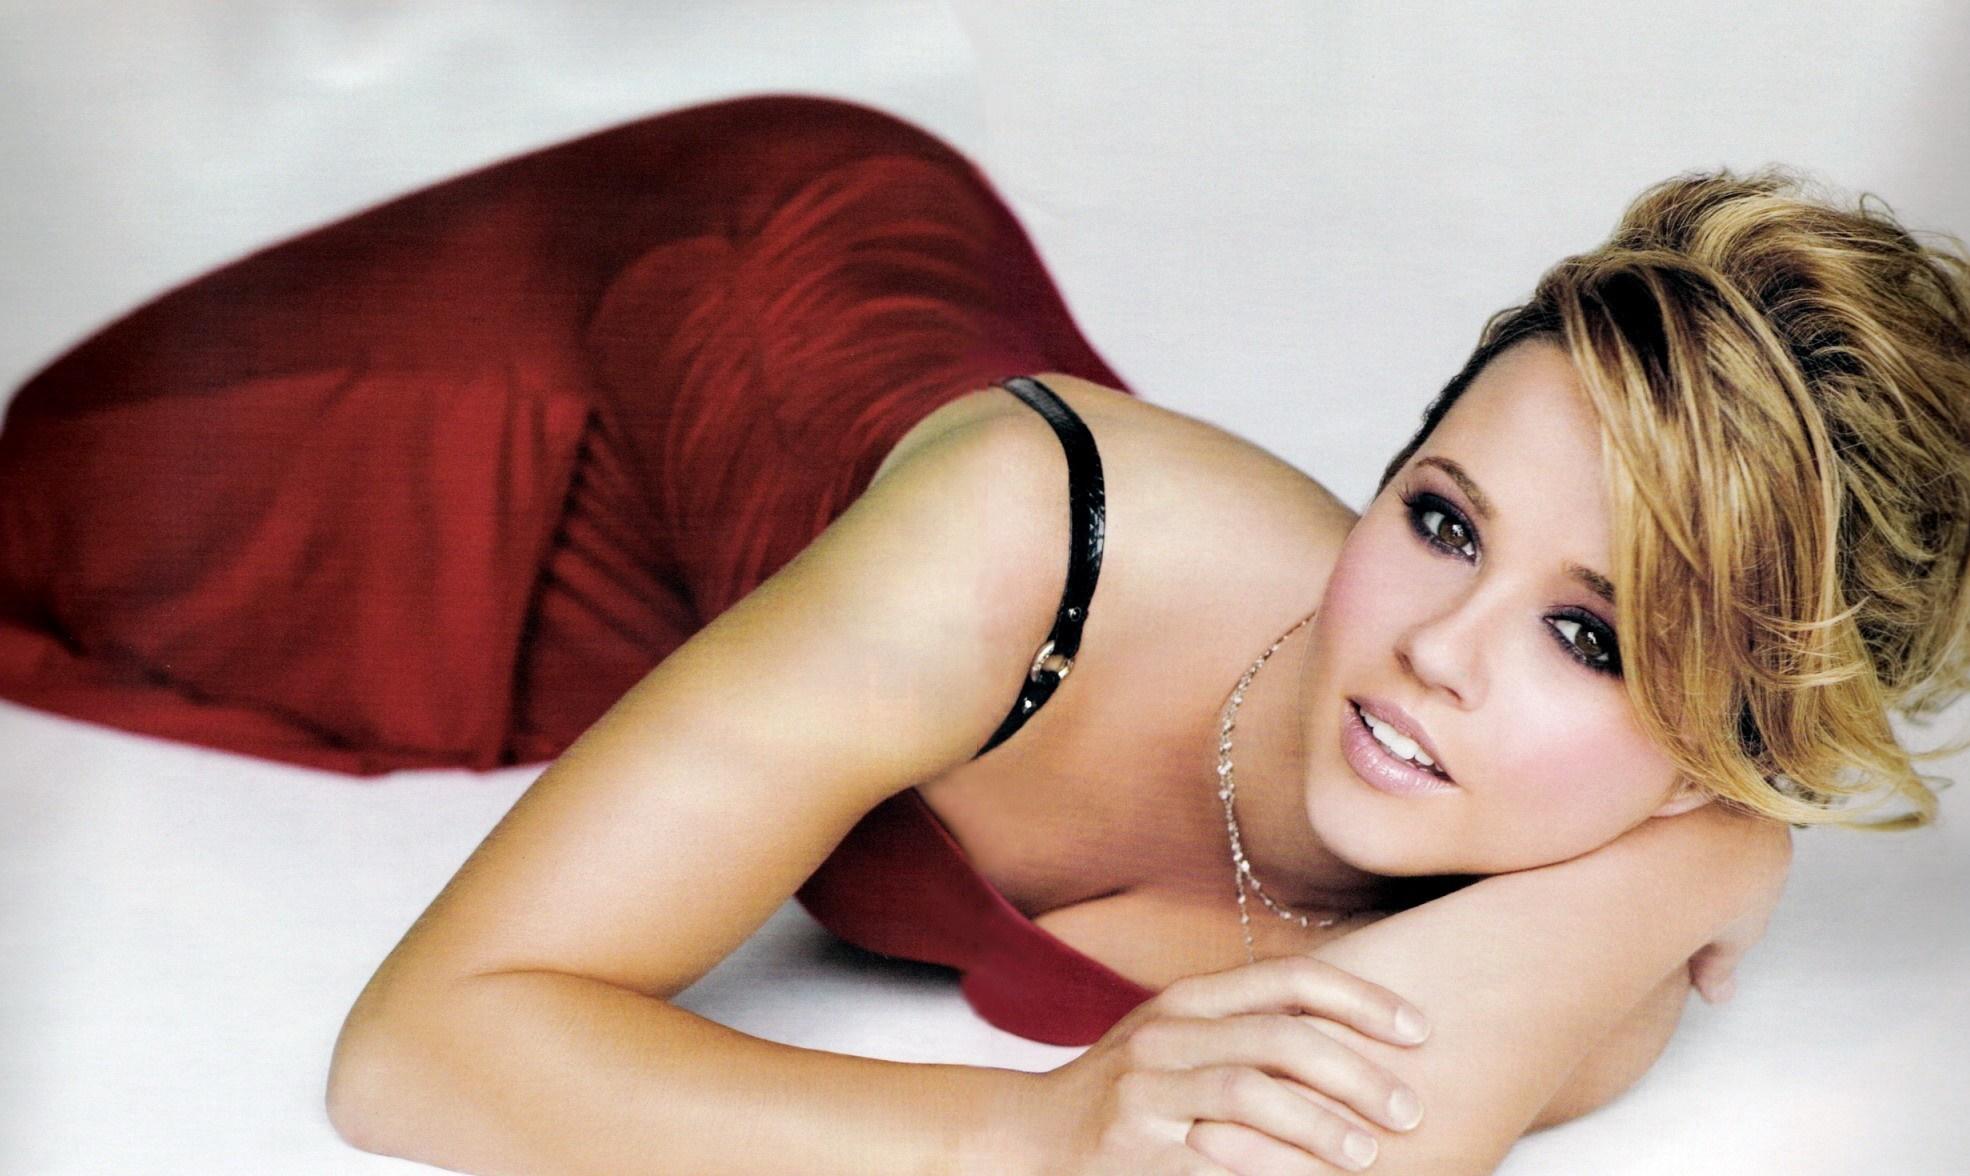 sensual pics of Linda Cardellini